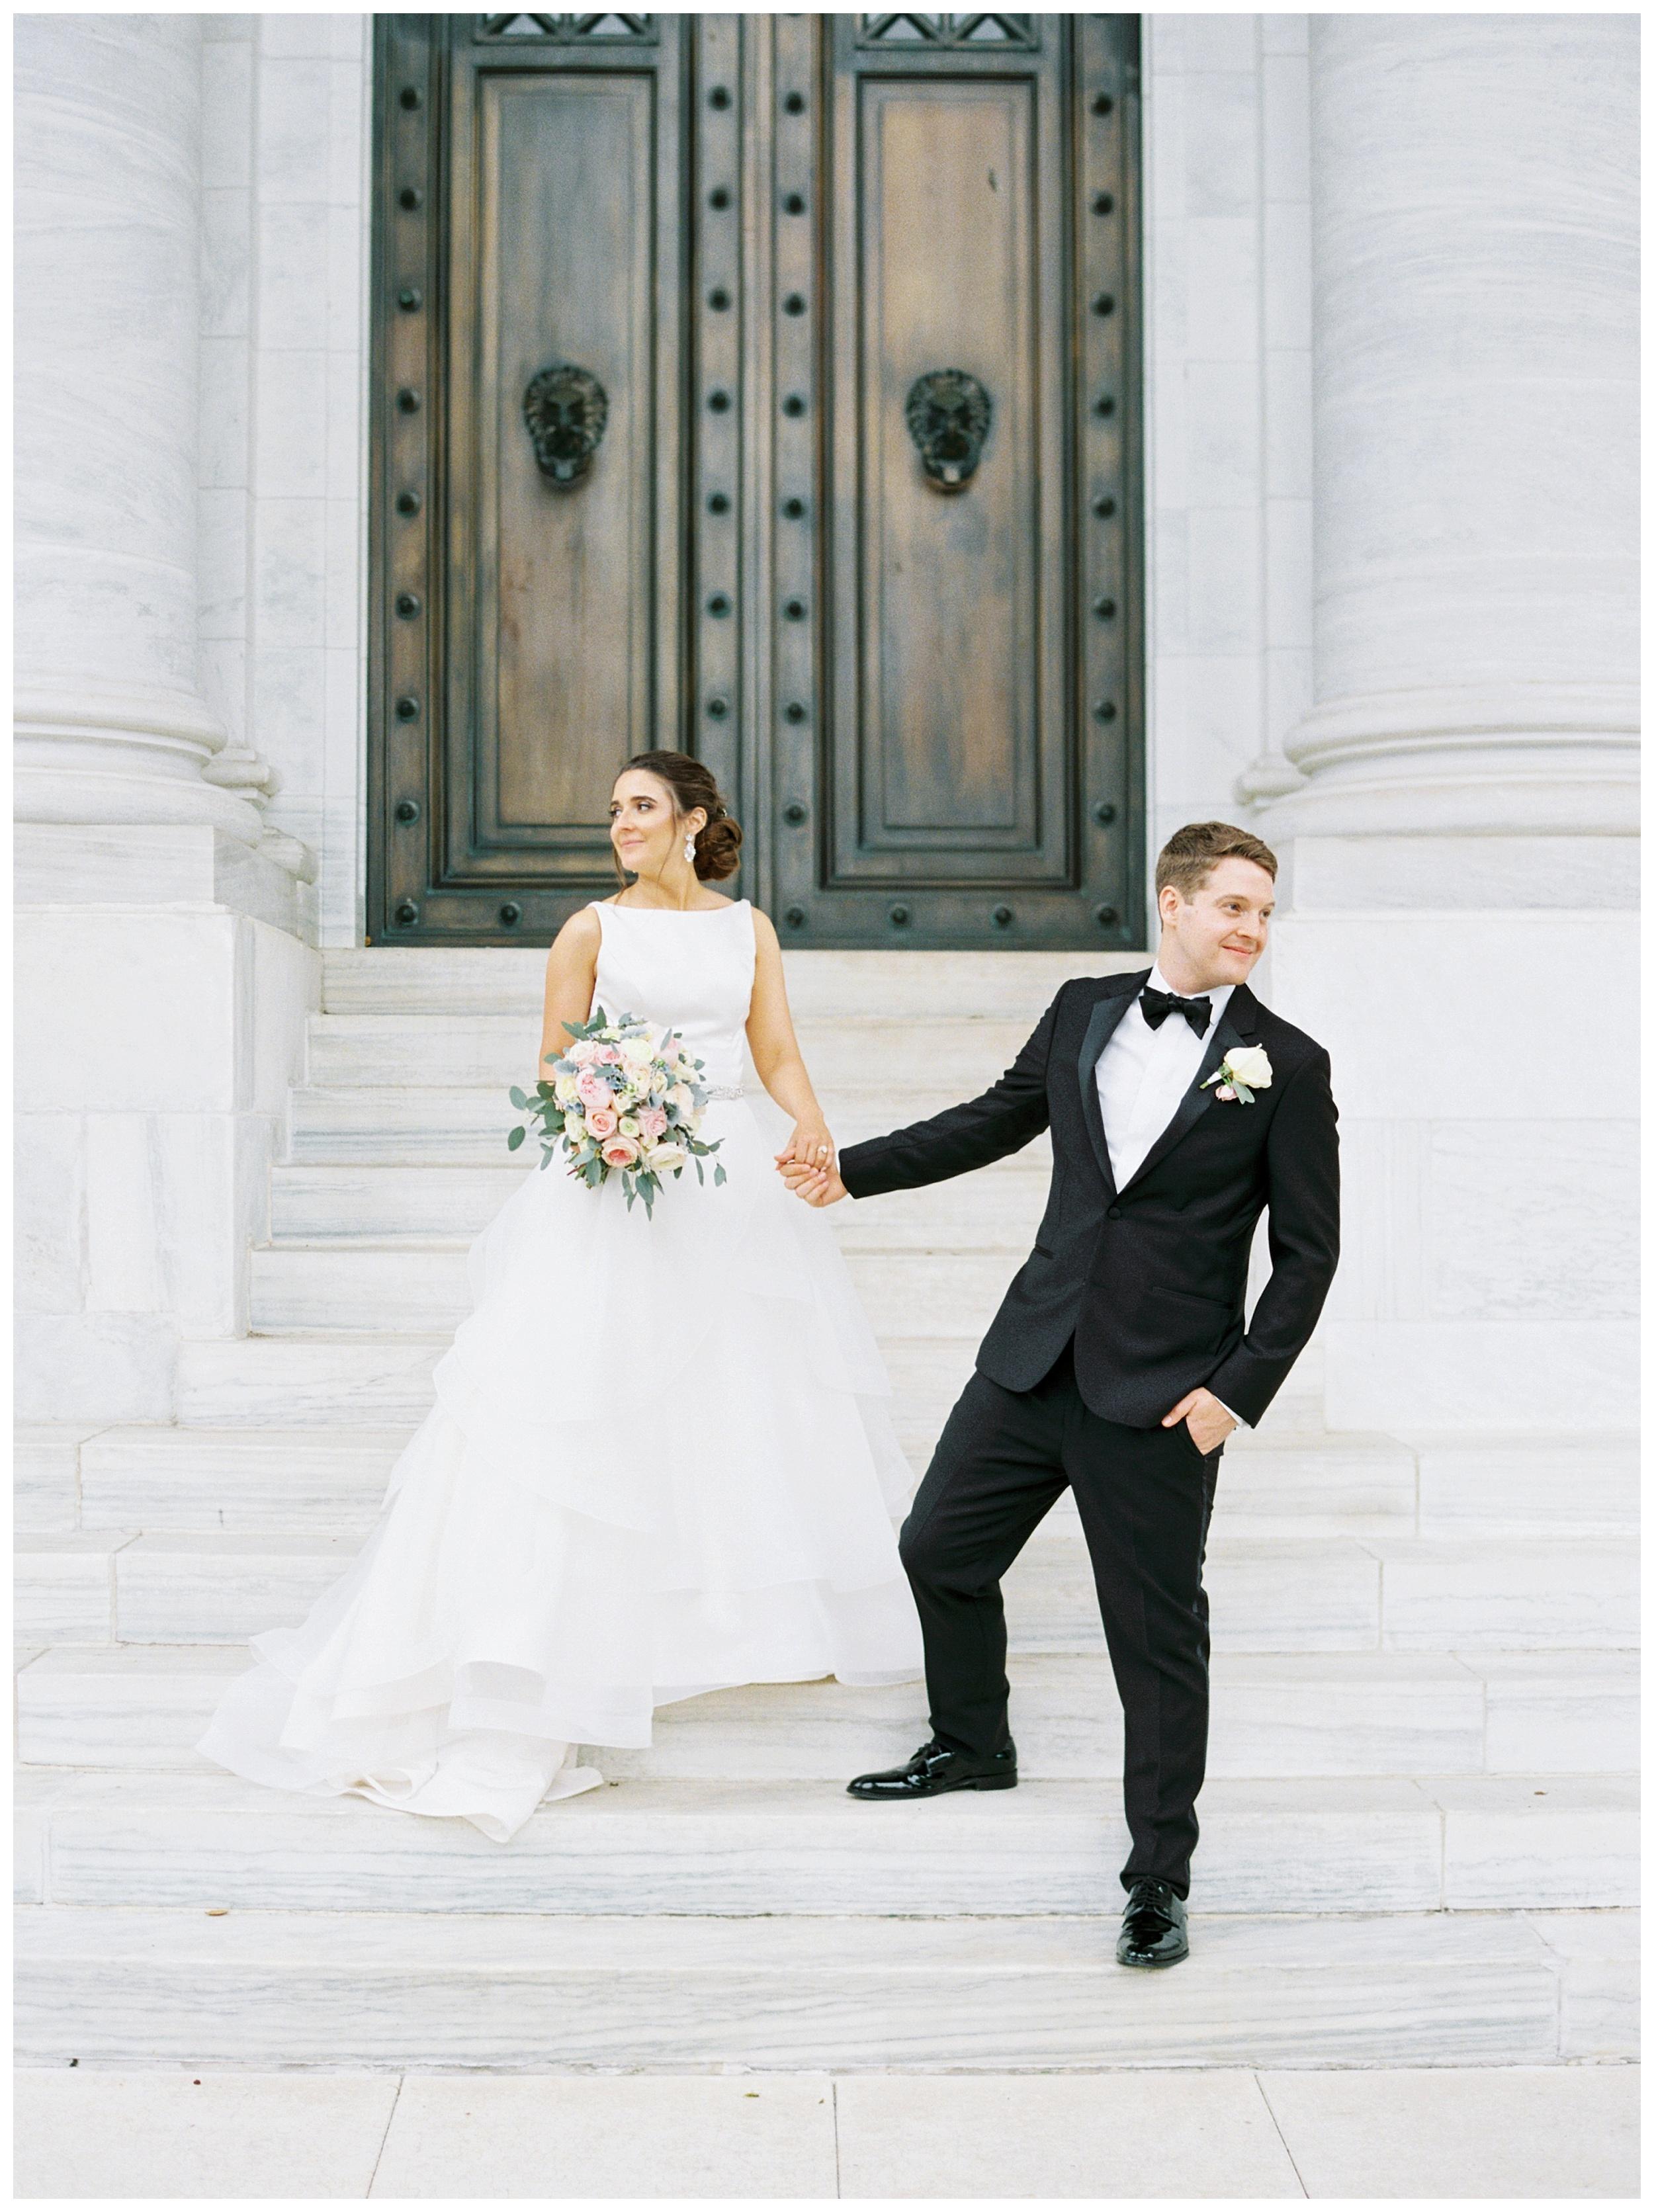 DAR Constitution Hall Wedding Wedding | Daughters of the American Revolution Wedding | District of Columbia Film Wedding Photographer Kir Tuben_0111.jpg